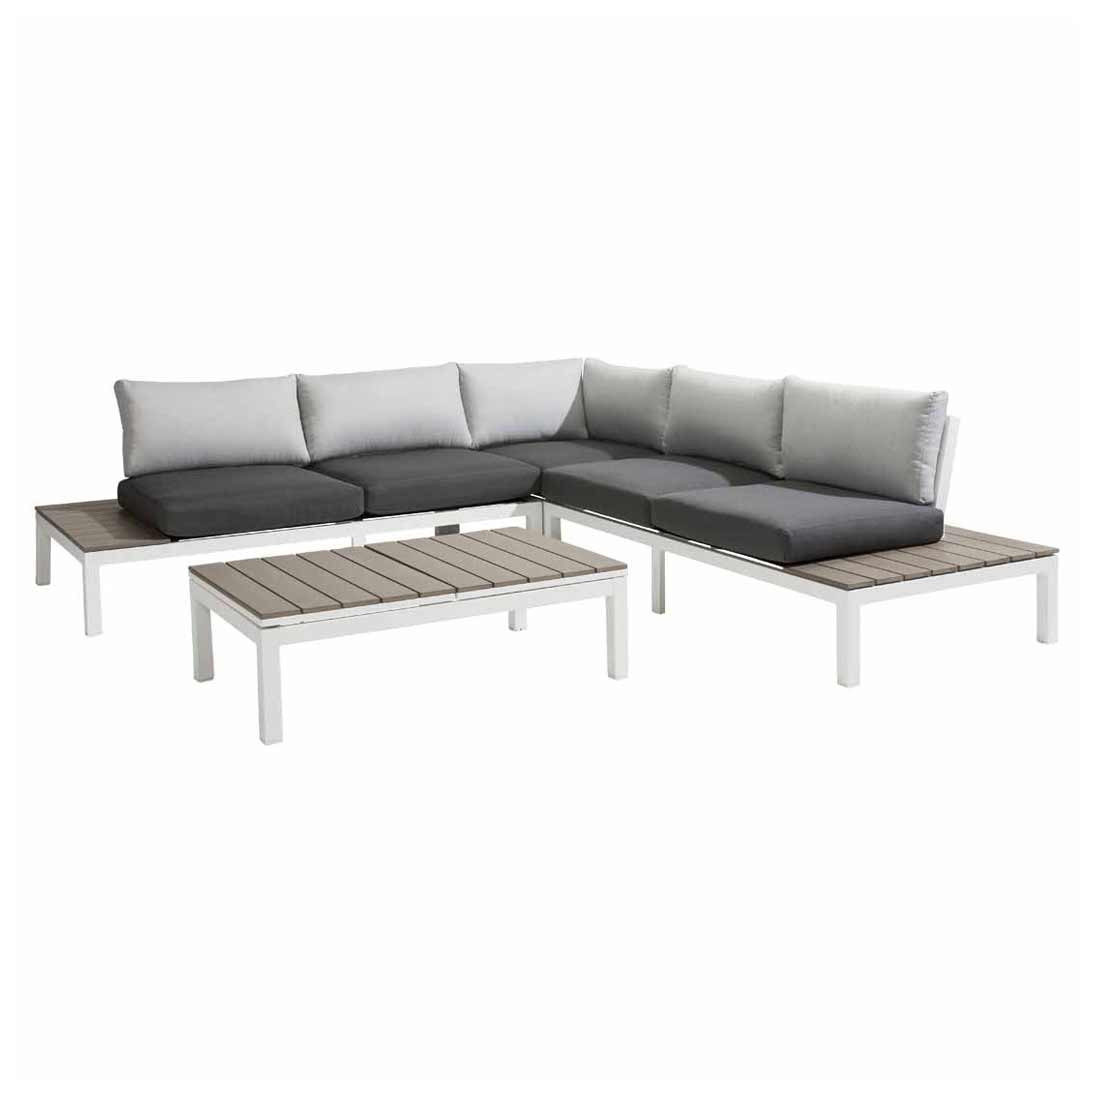 Full Size of Outliv Loungemöbel Hamilton Loungeecke 4 Teilig Aluminium Polywood Garten Günstig Holz Wohnzimmer Outliv Loungemöbel